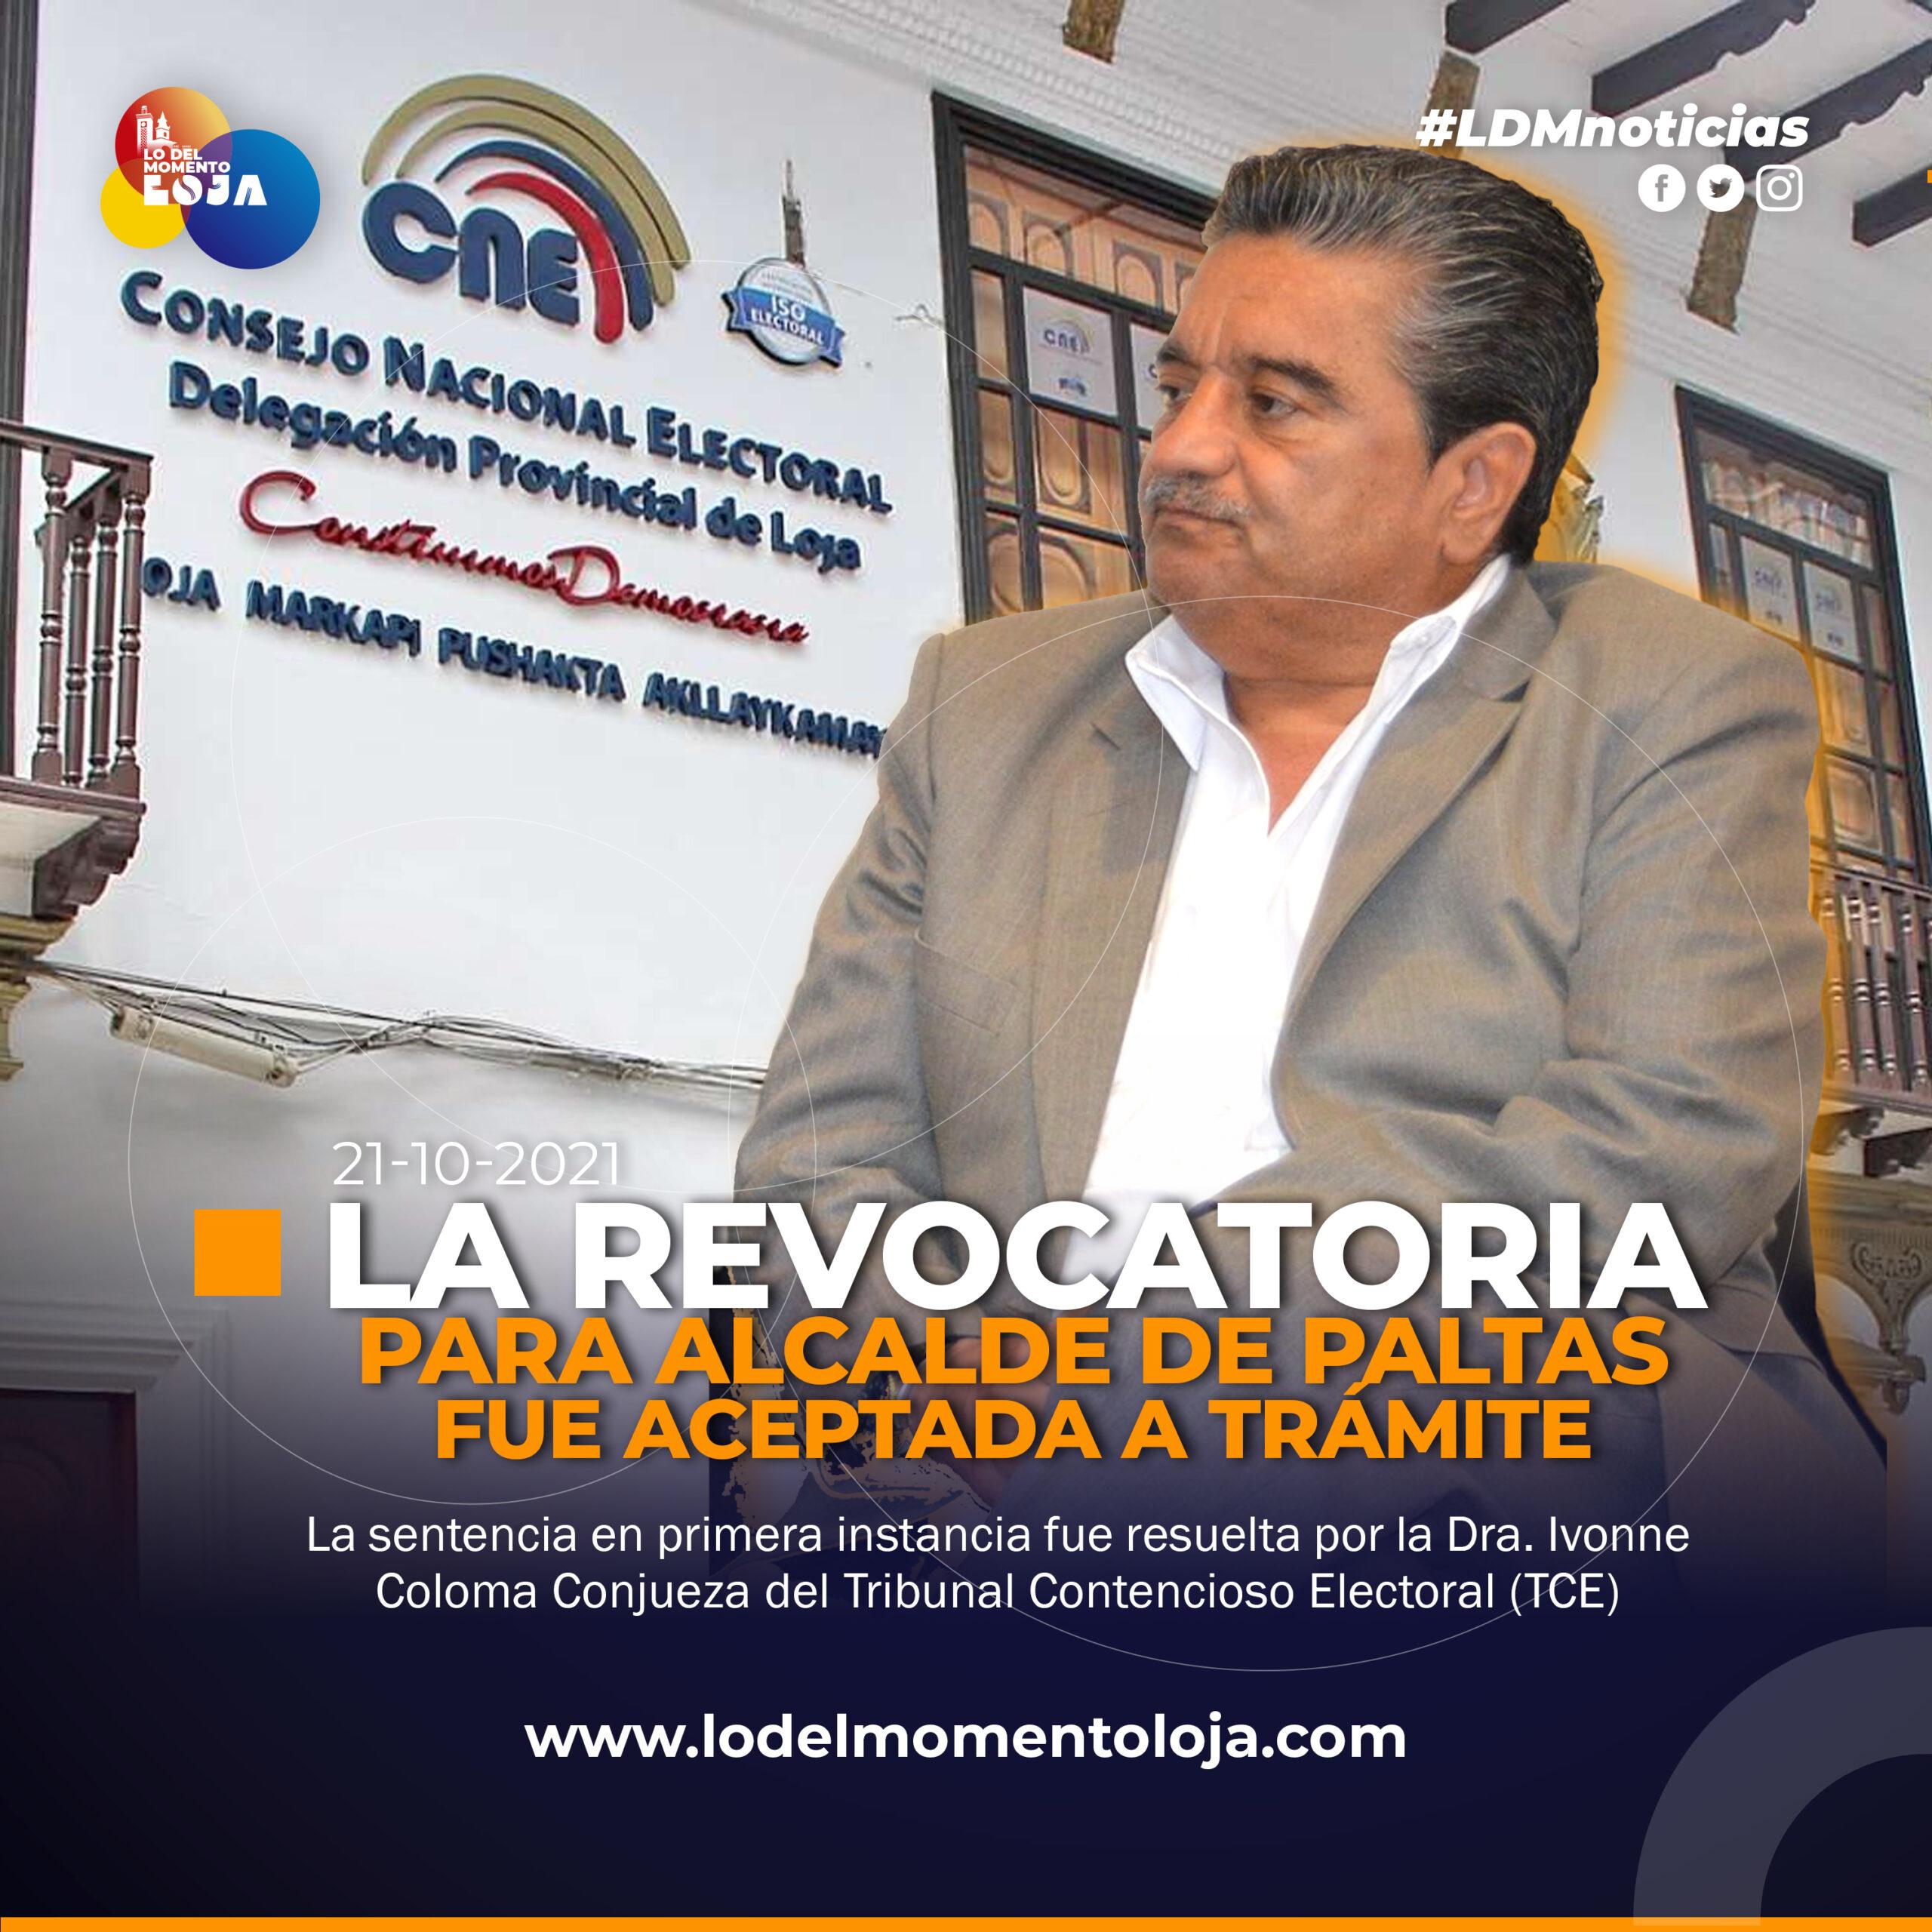 Inician proceso de revocatoria contra Alcalde de Paltas